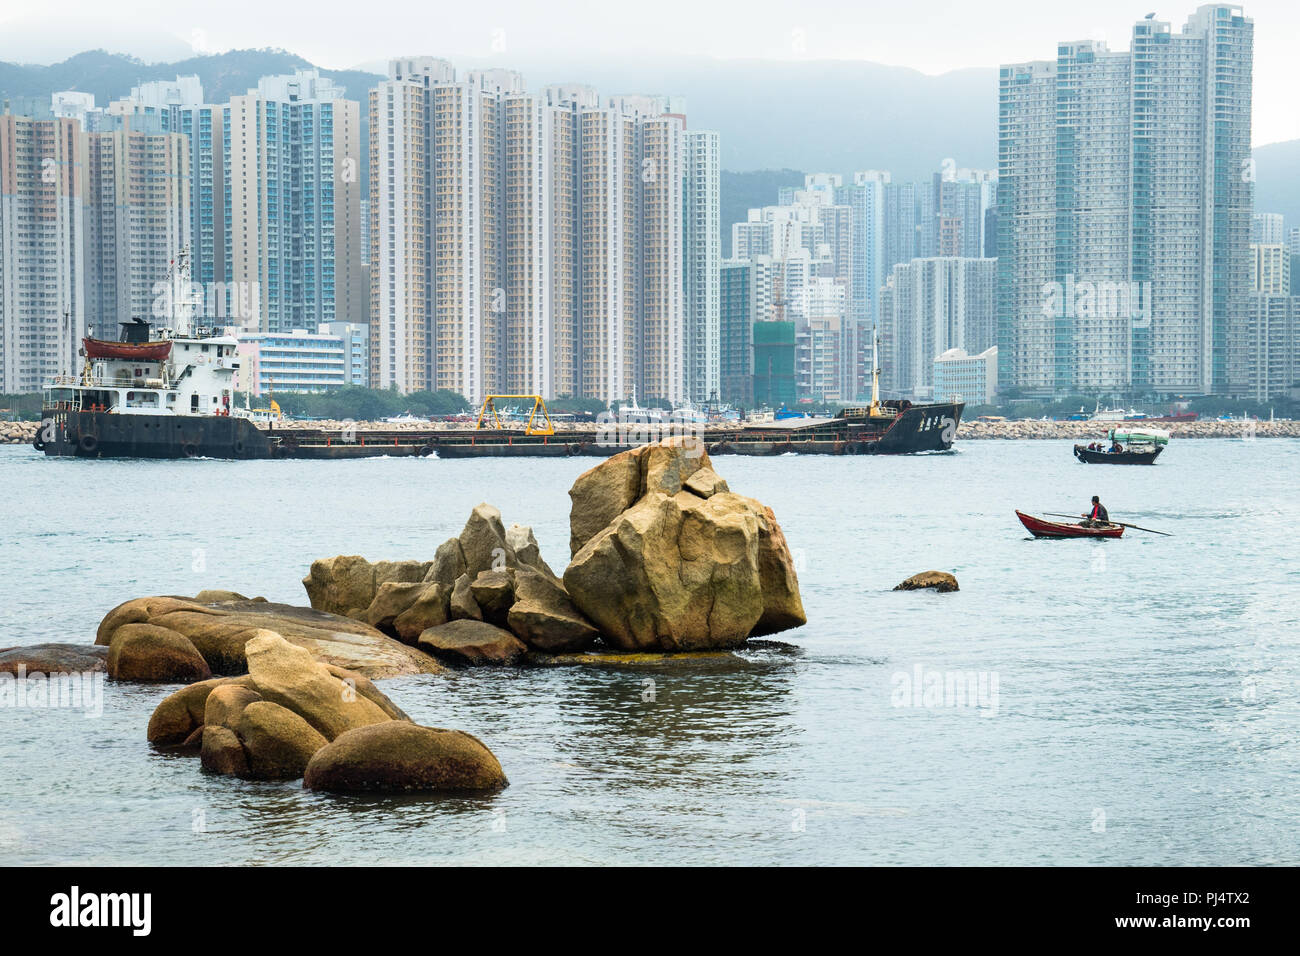 Gemeinsam genutzte Wasserstraße in den Hafen von Hong Kong, im Stadtteil Kwun Tong Hong Kong Stockbild